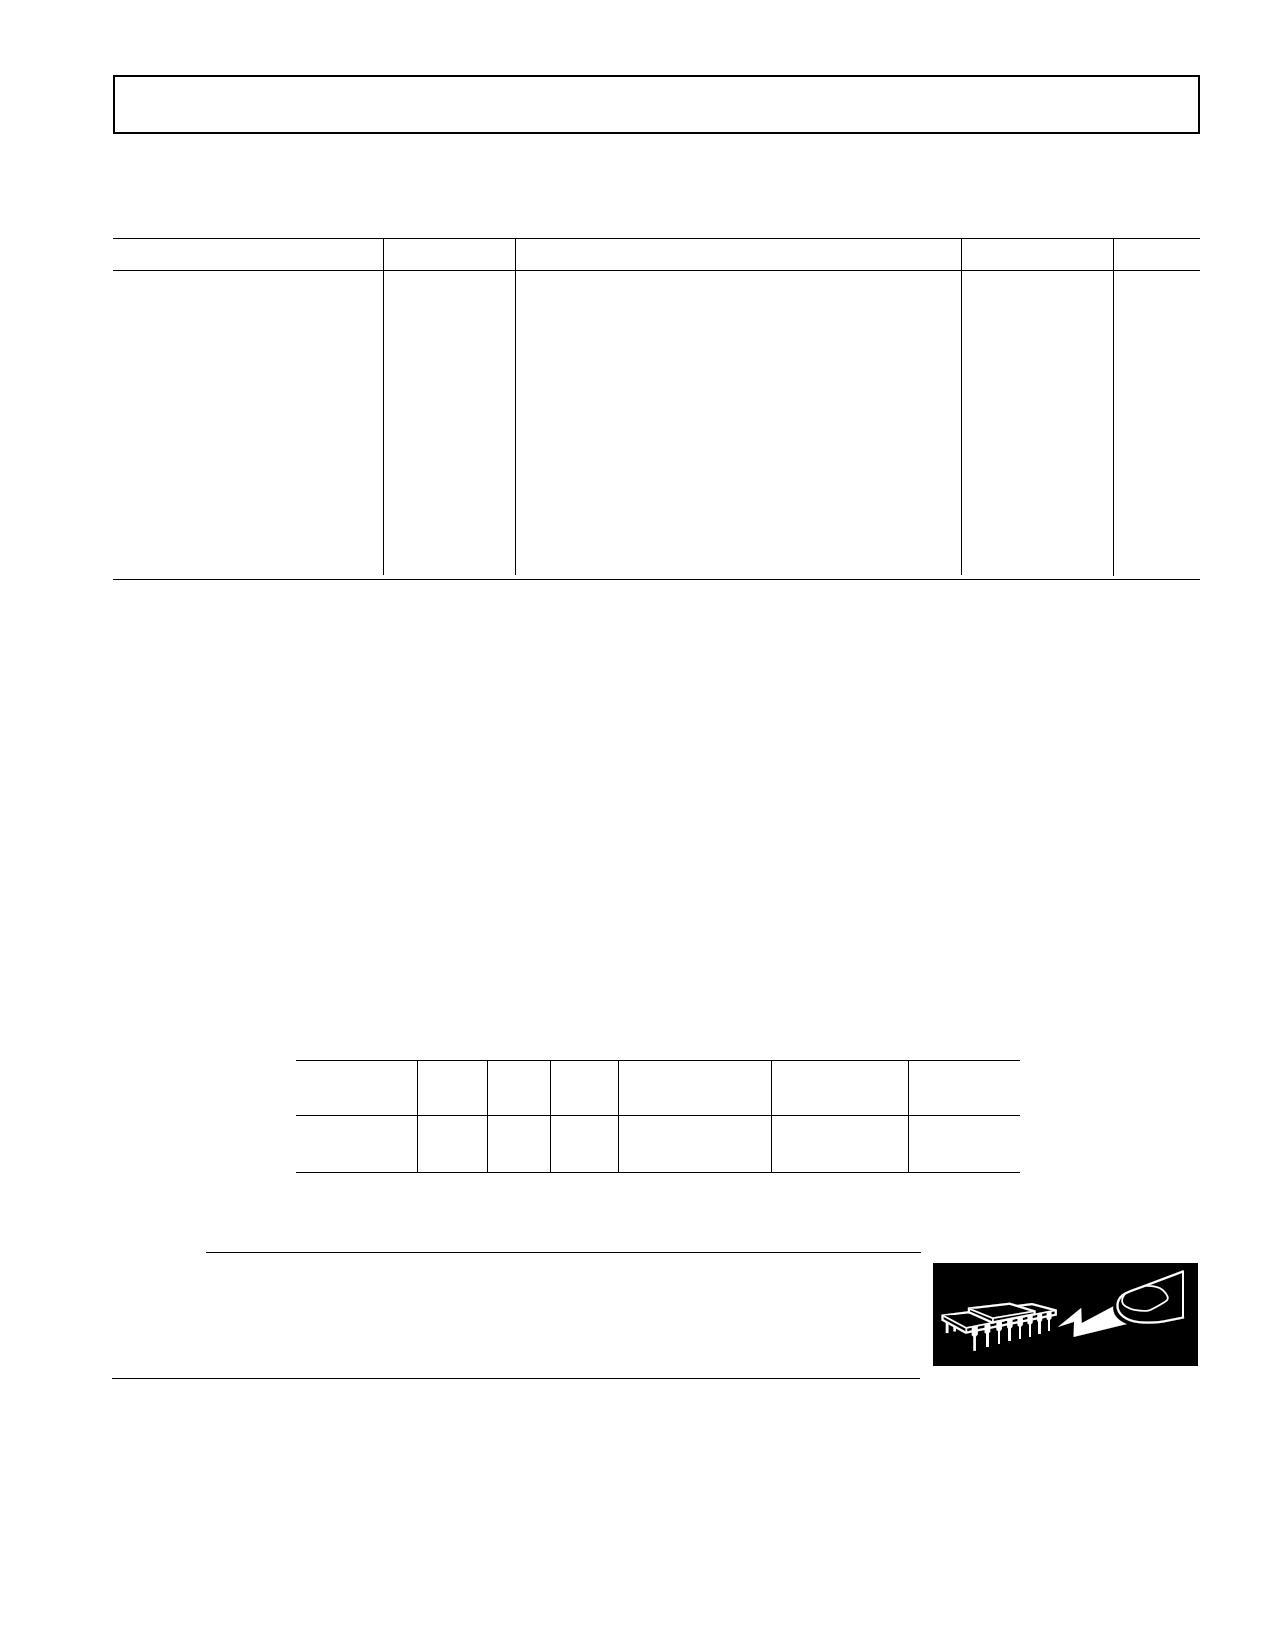 AD5544 pdf, arduino